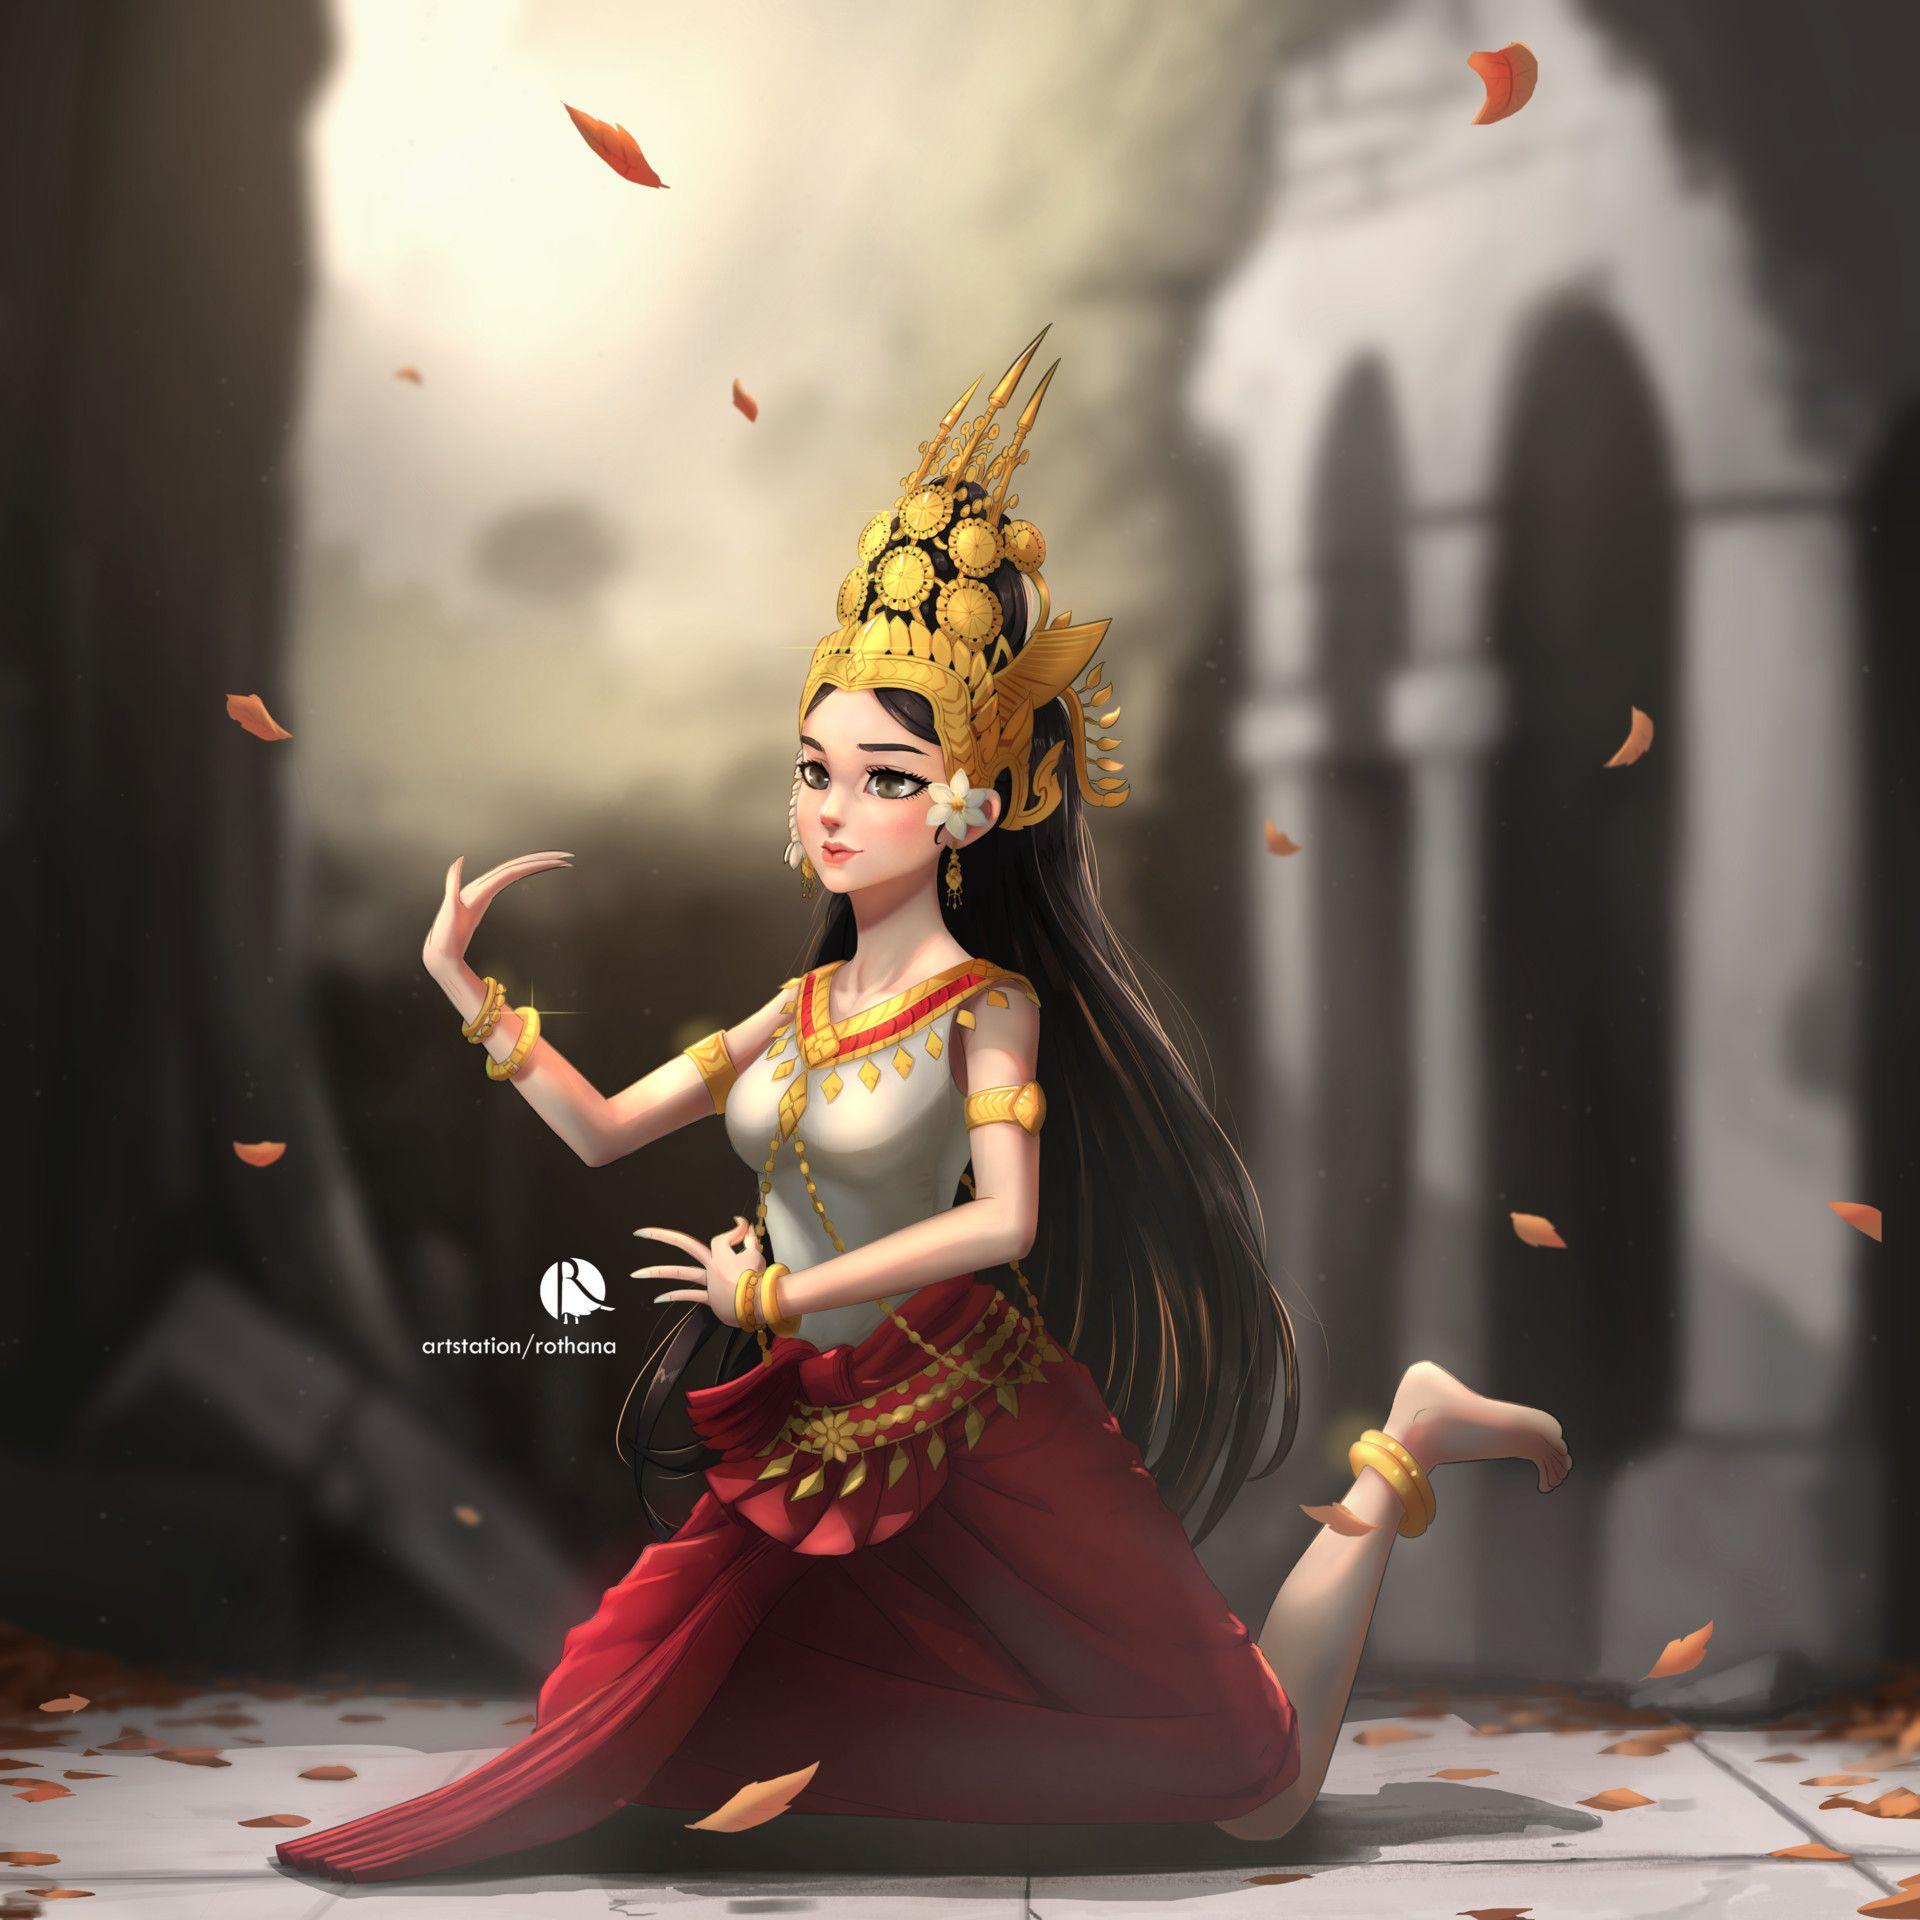 ArtStation - Apsara, Rothana Chhourm   ศิลปะร่วมสมัย ...